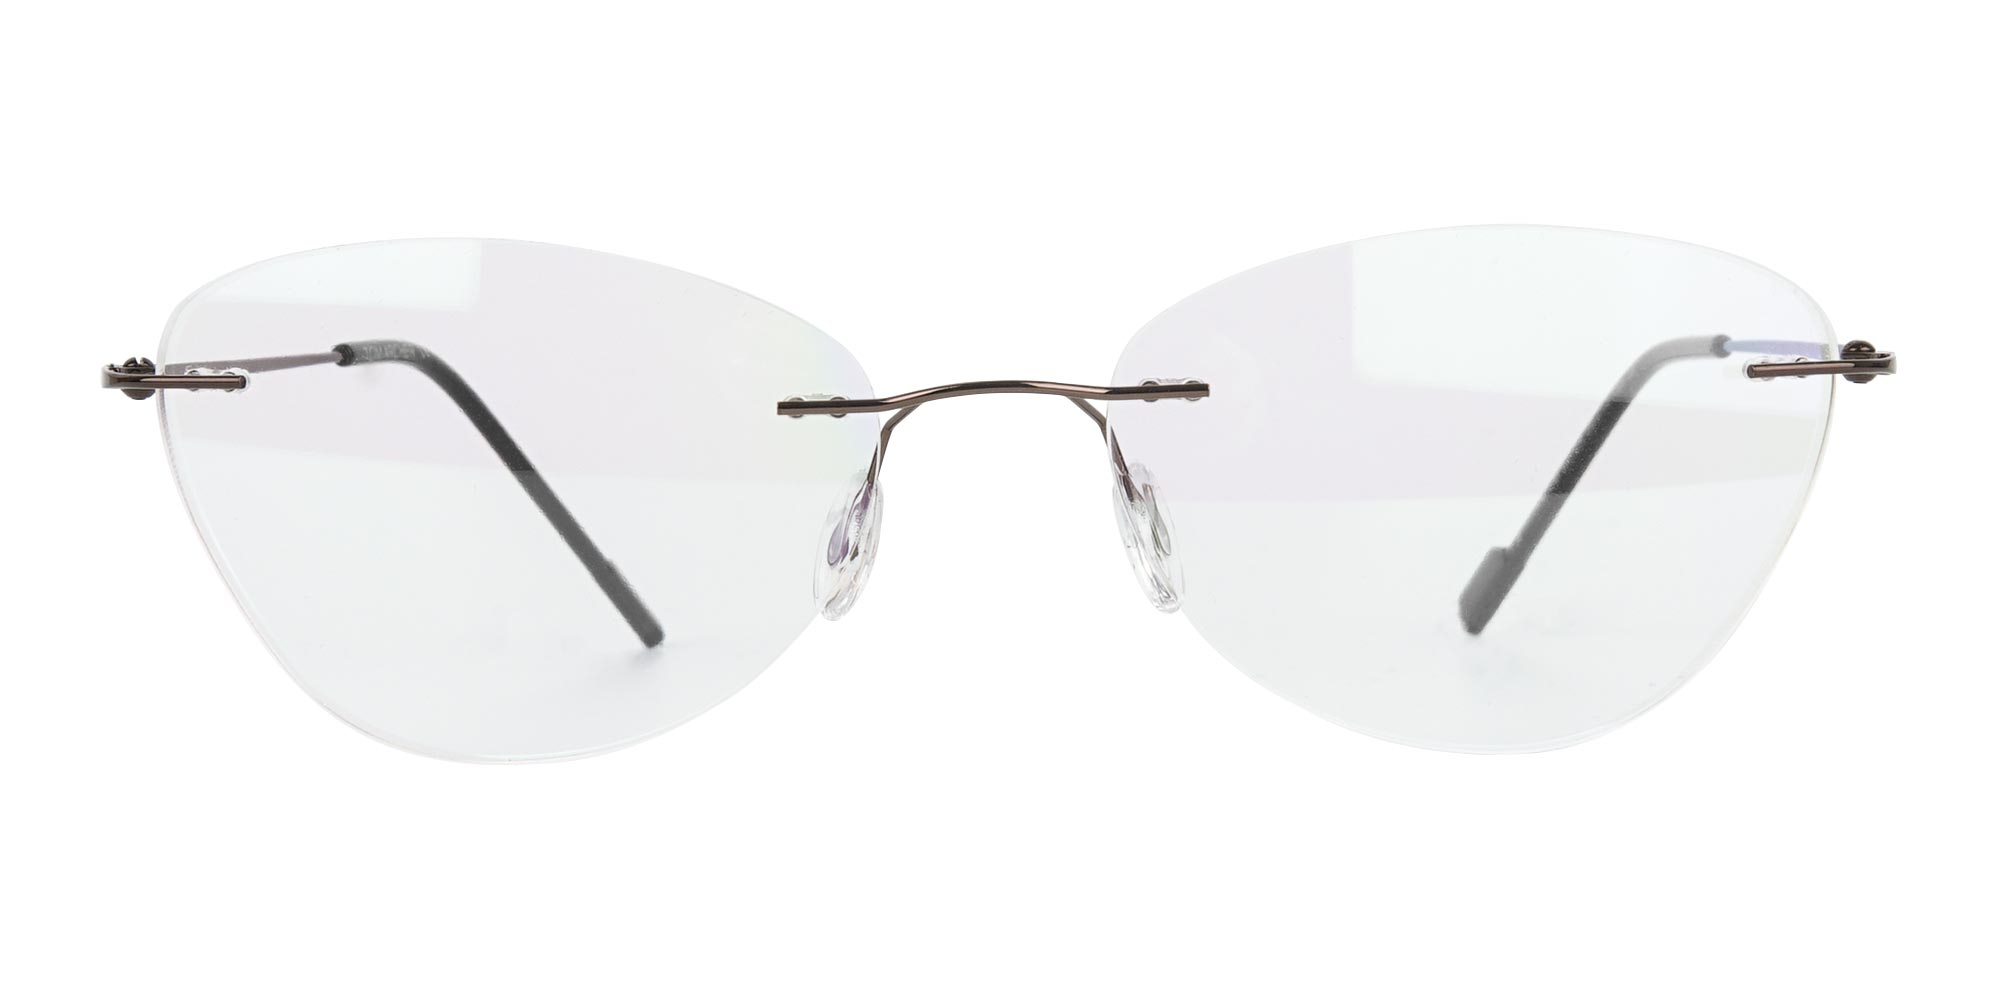 cat eye rimless glasses for square face shape